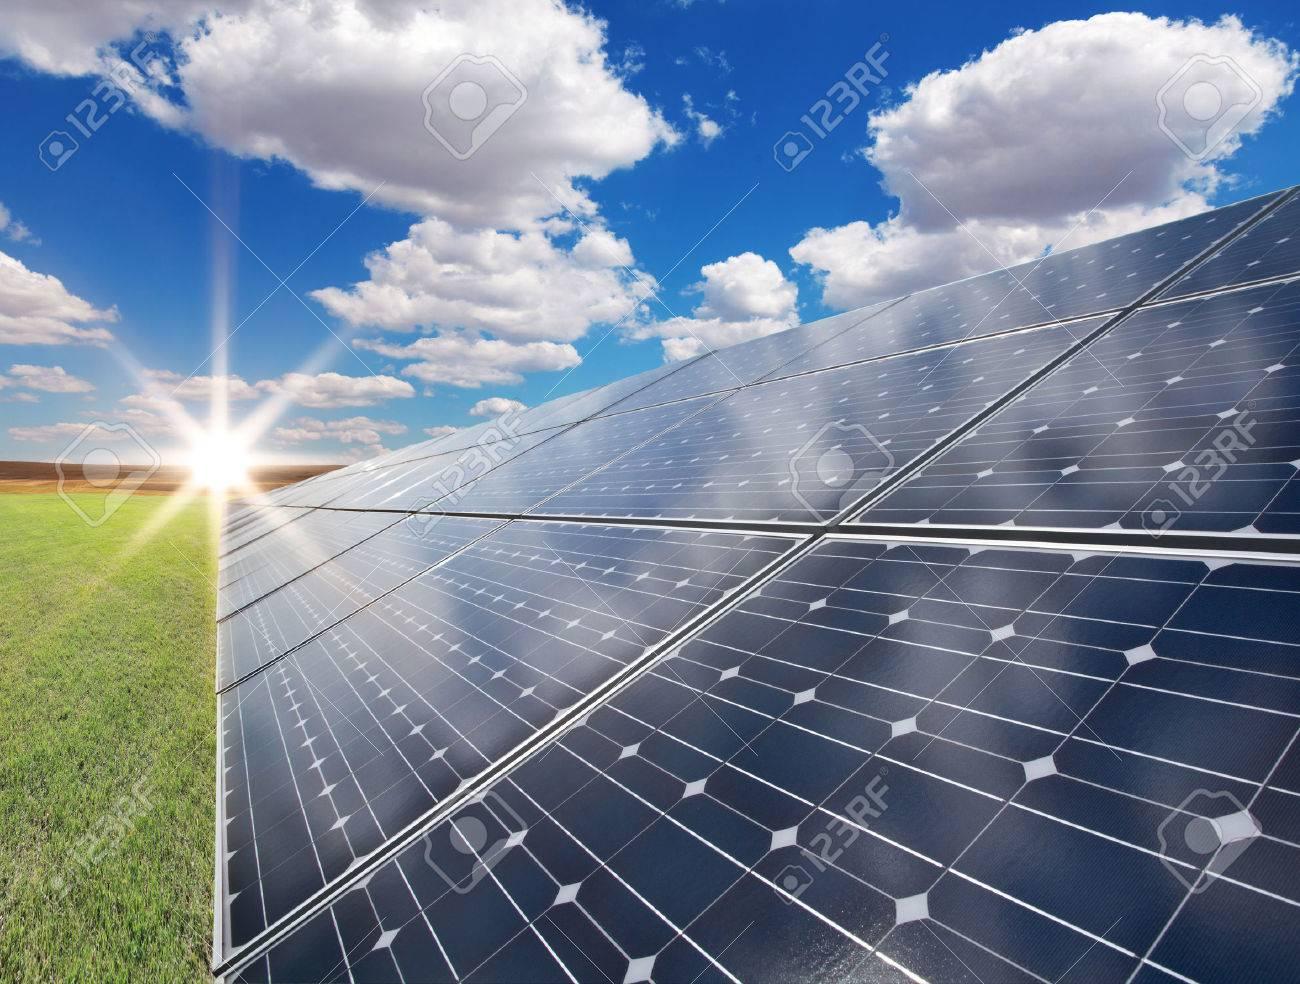 Power plant using renewable solar energy - 50335726